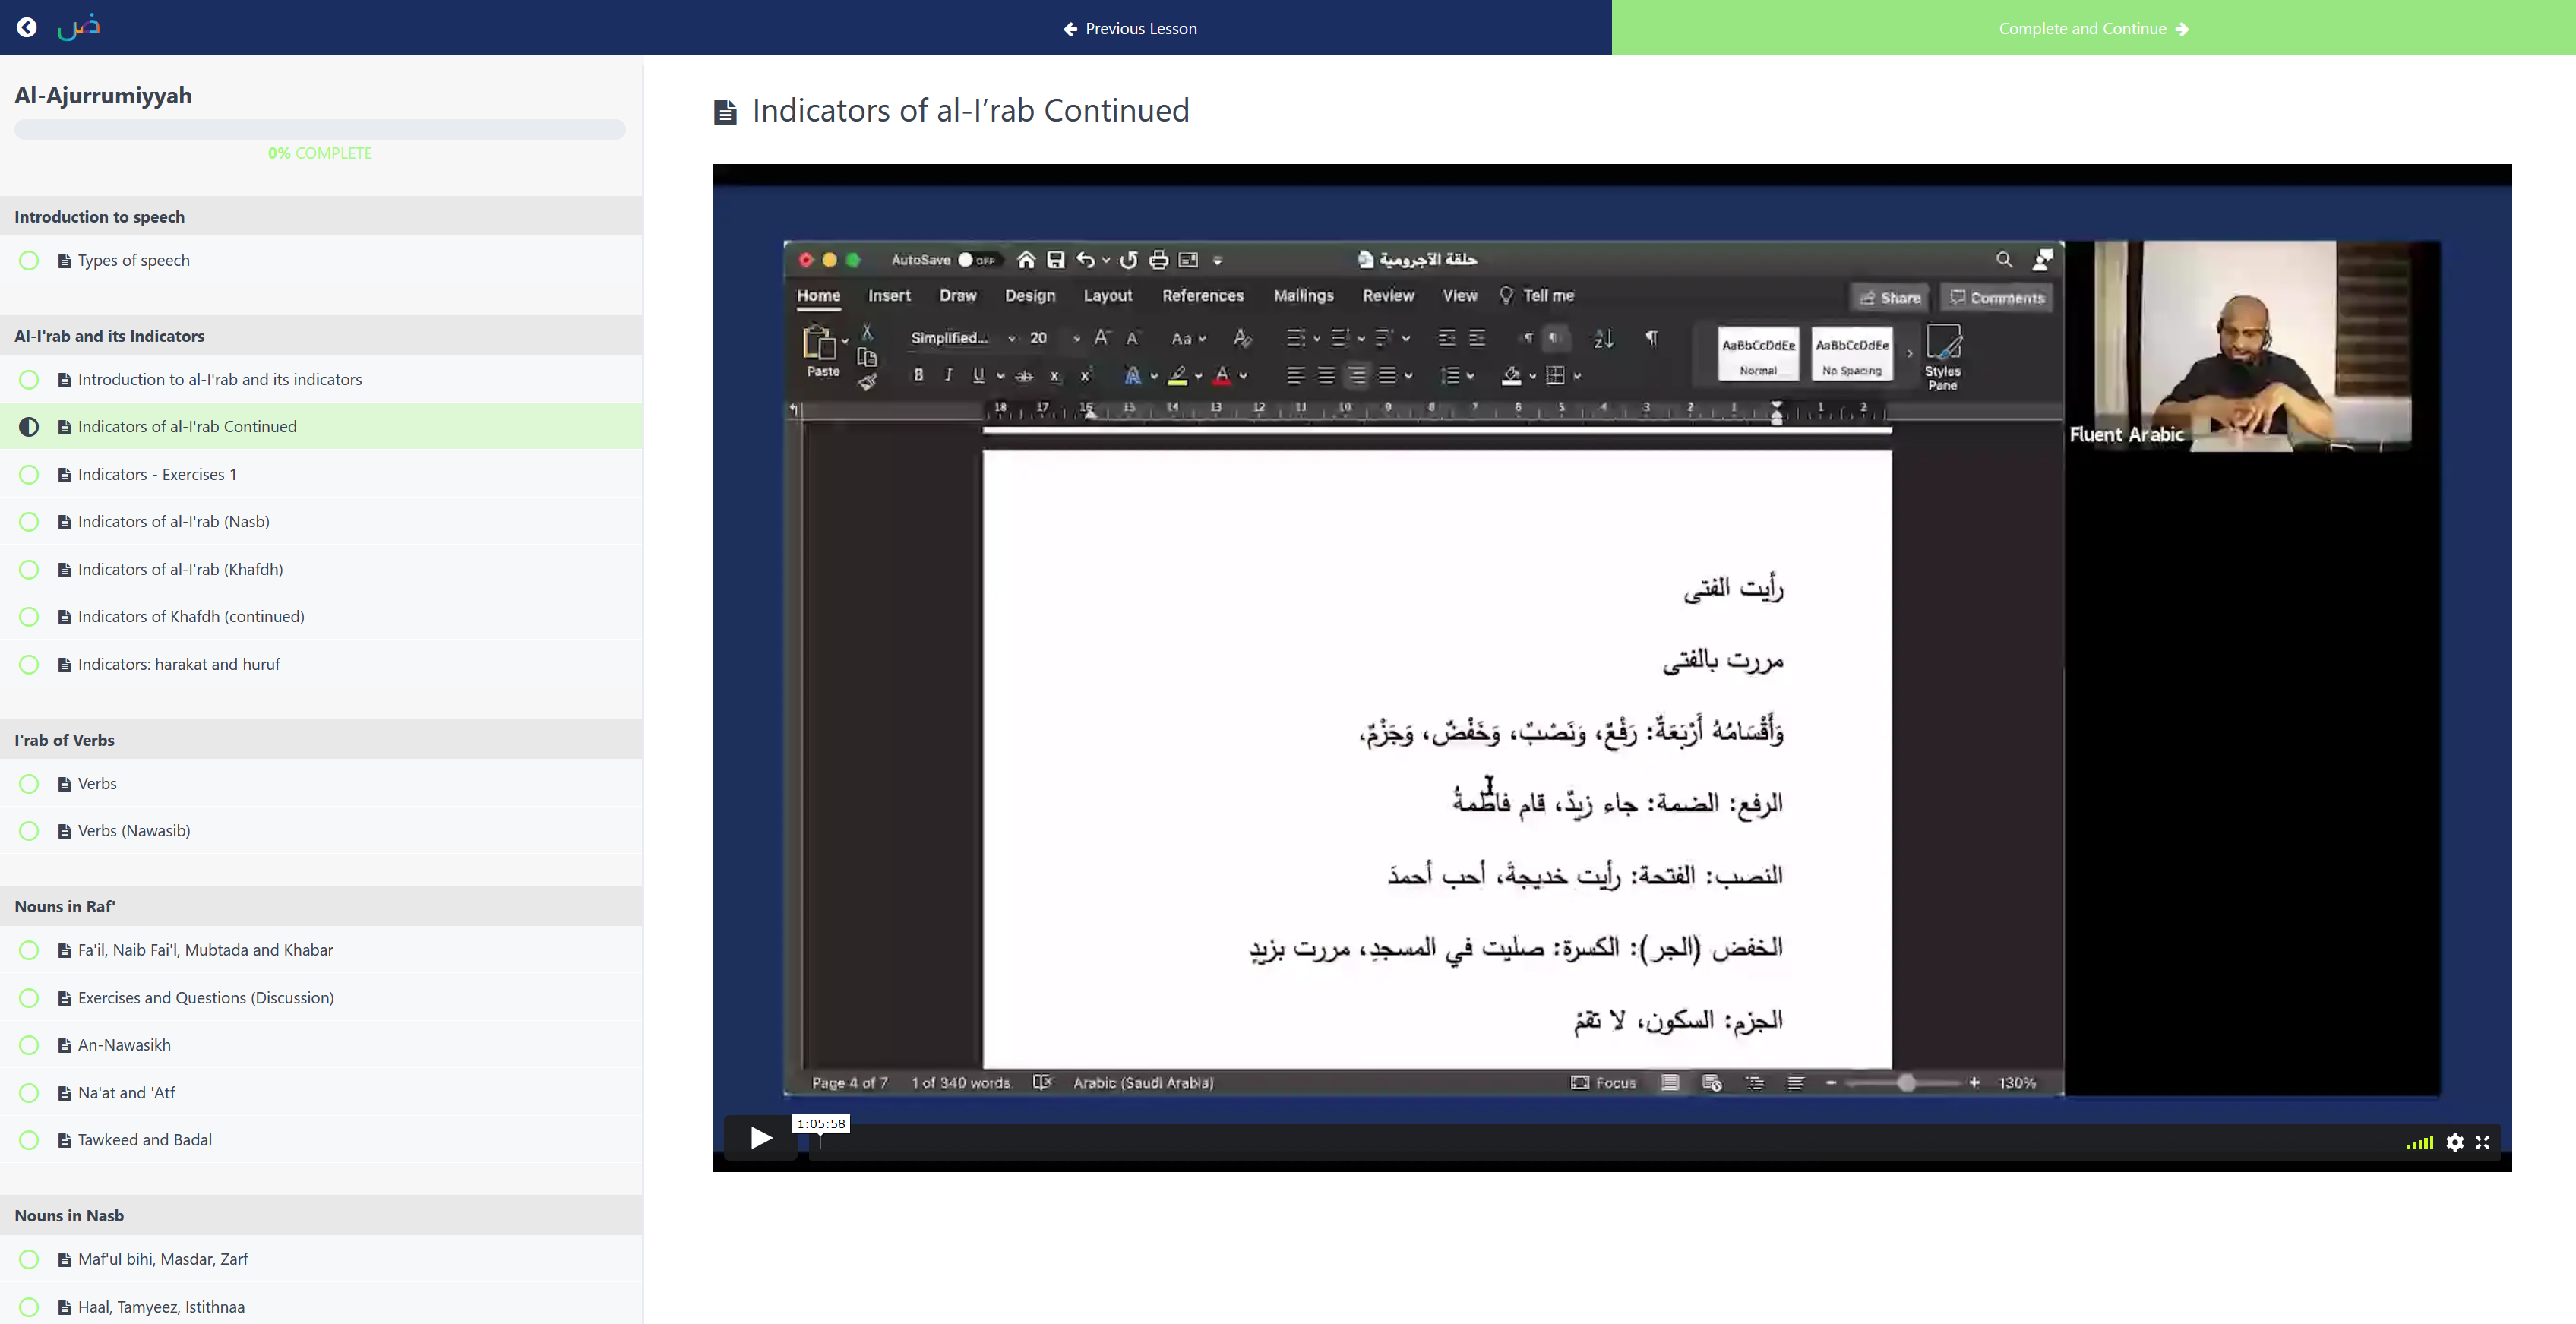 Ajrumiyyah on demand course by Fluent Arabic